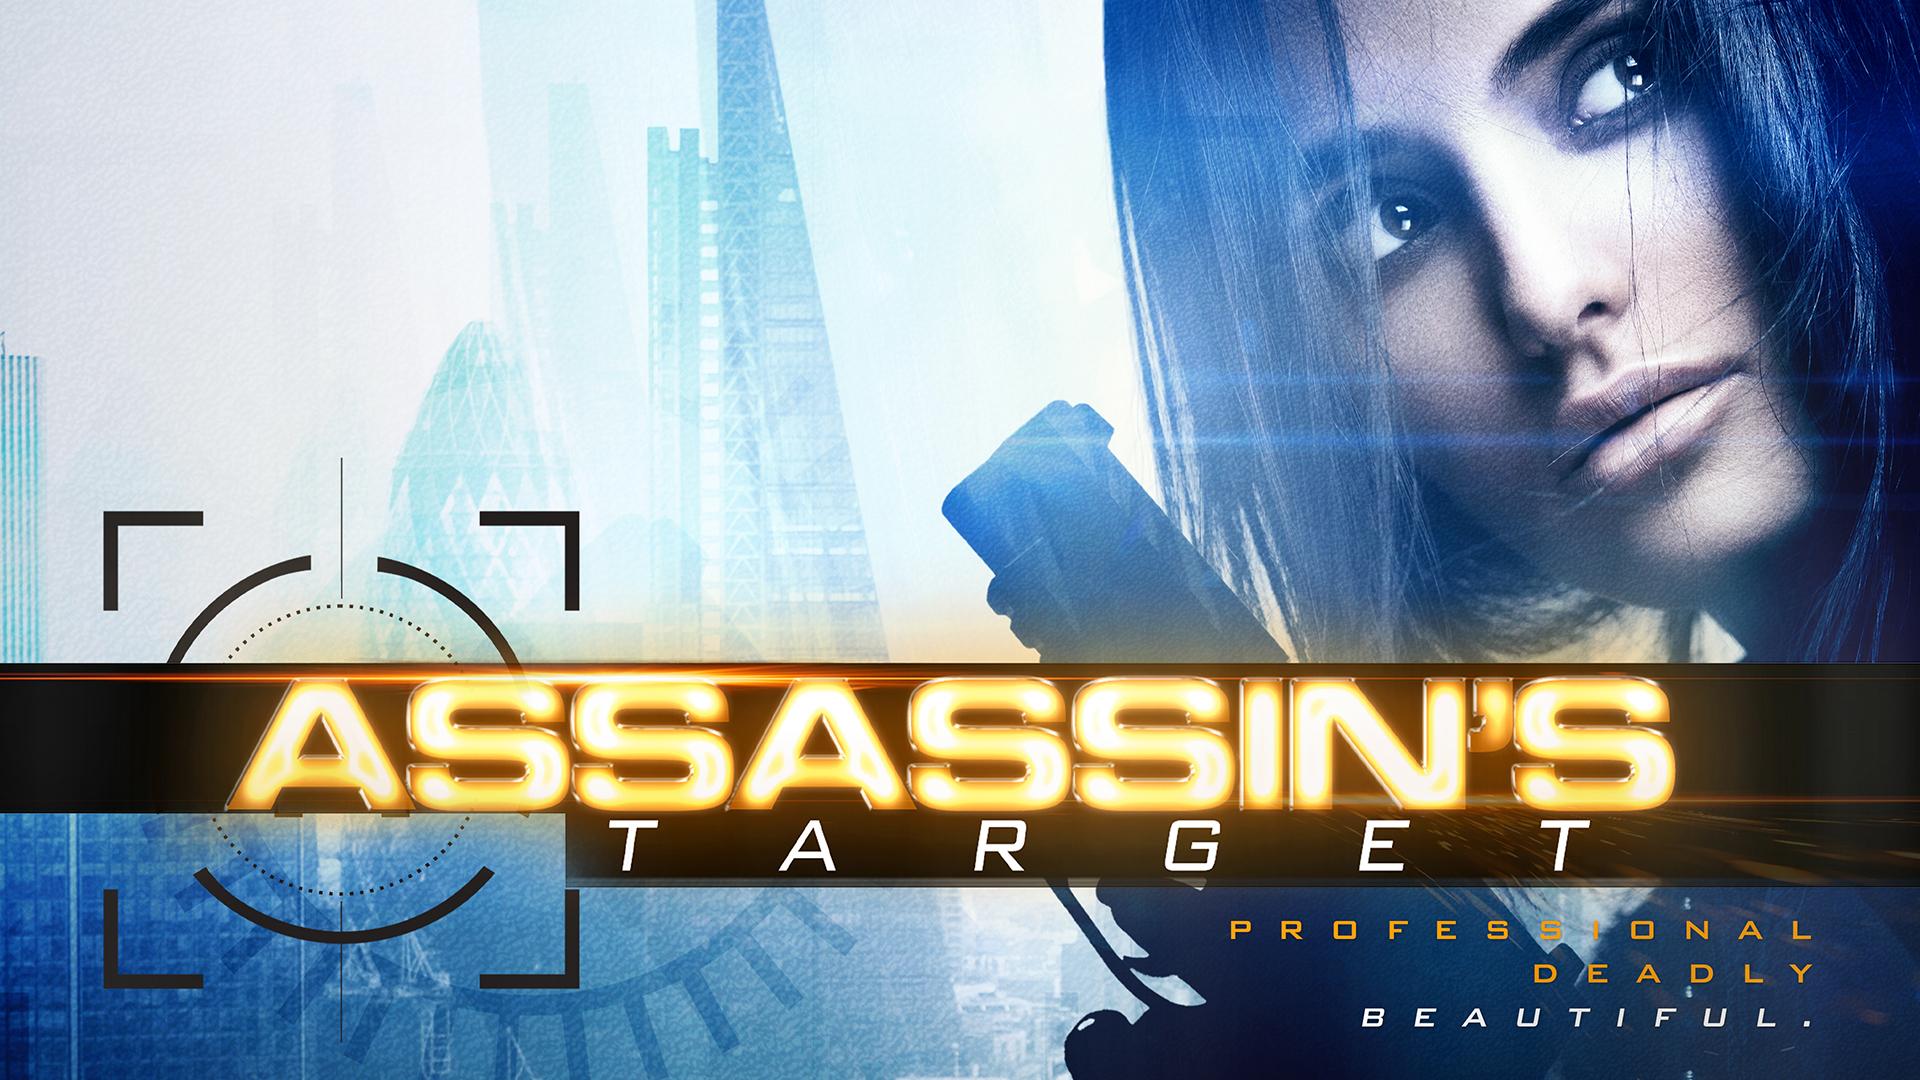 Assassin's Target